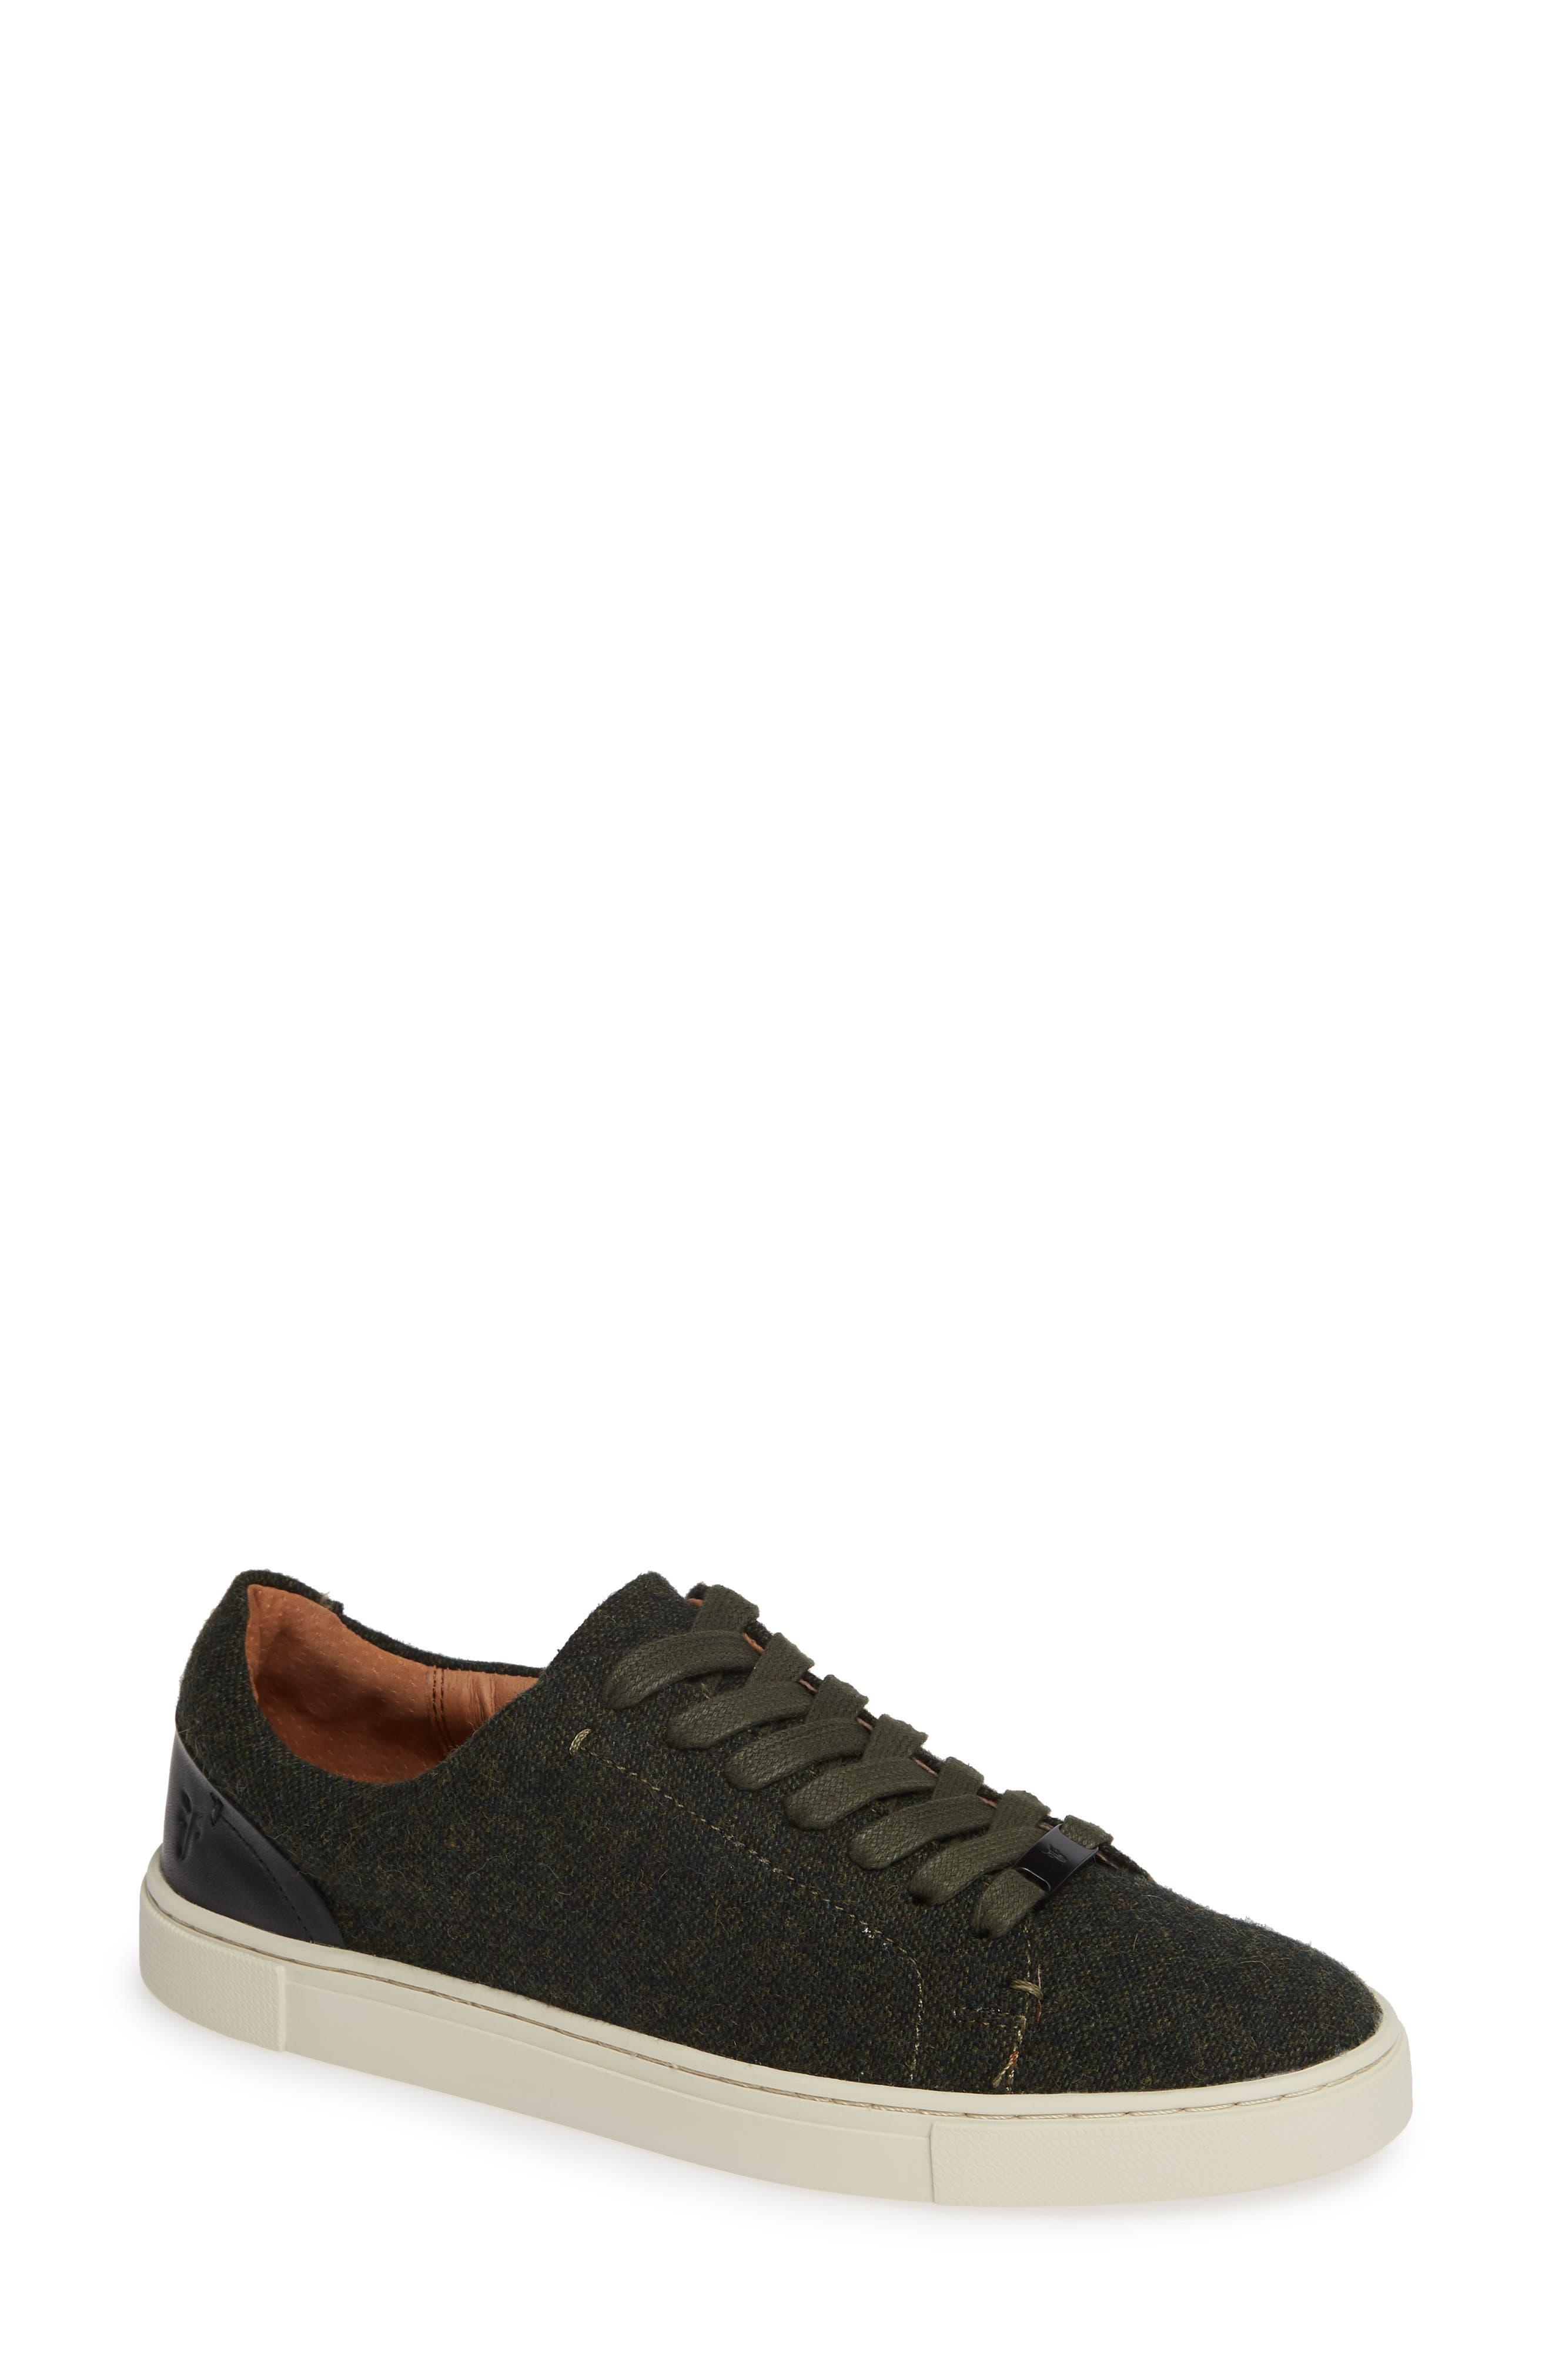 des chaussures adidas adizero premier ltd road à road ltd runner, sports c9946d